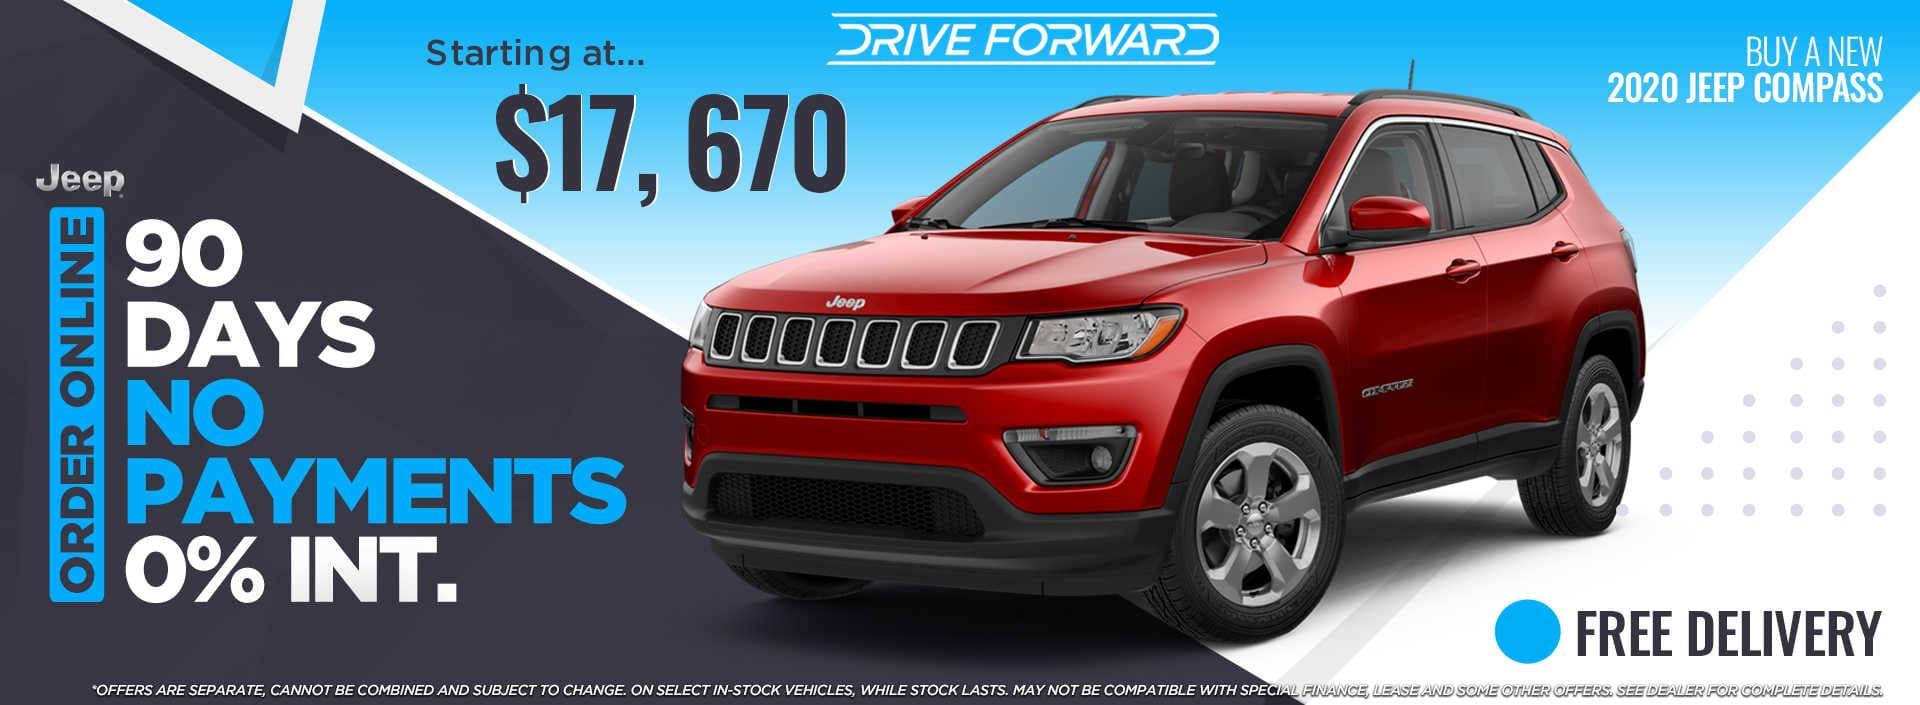 2020 Jeep Compass For Sale April